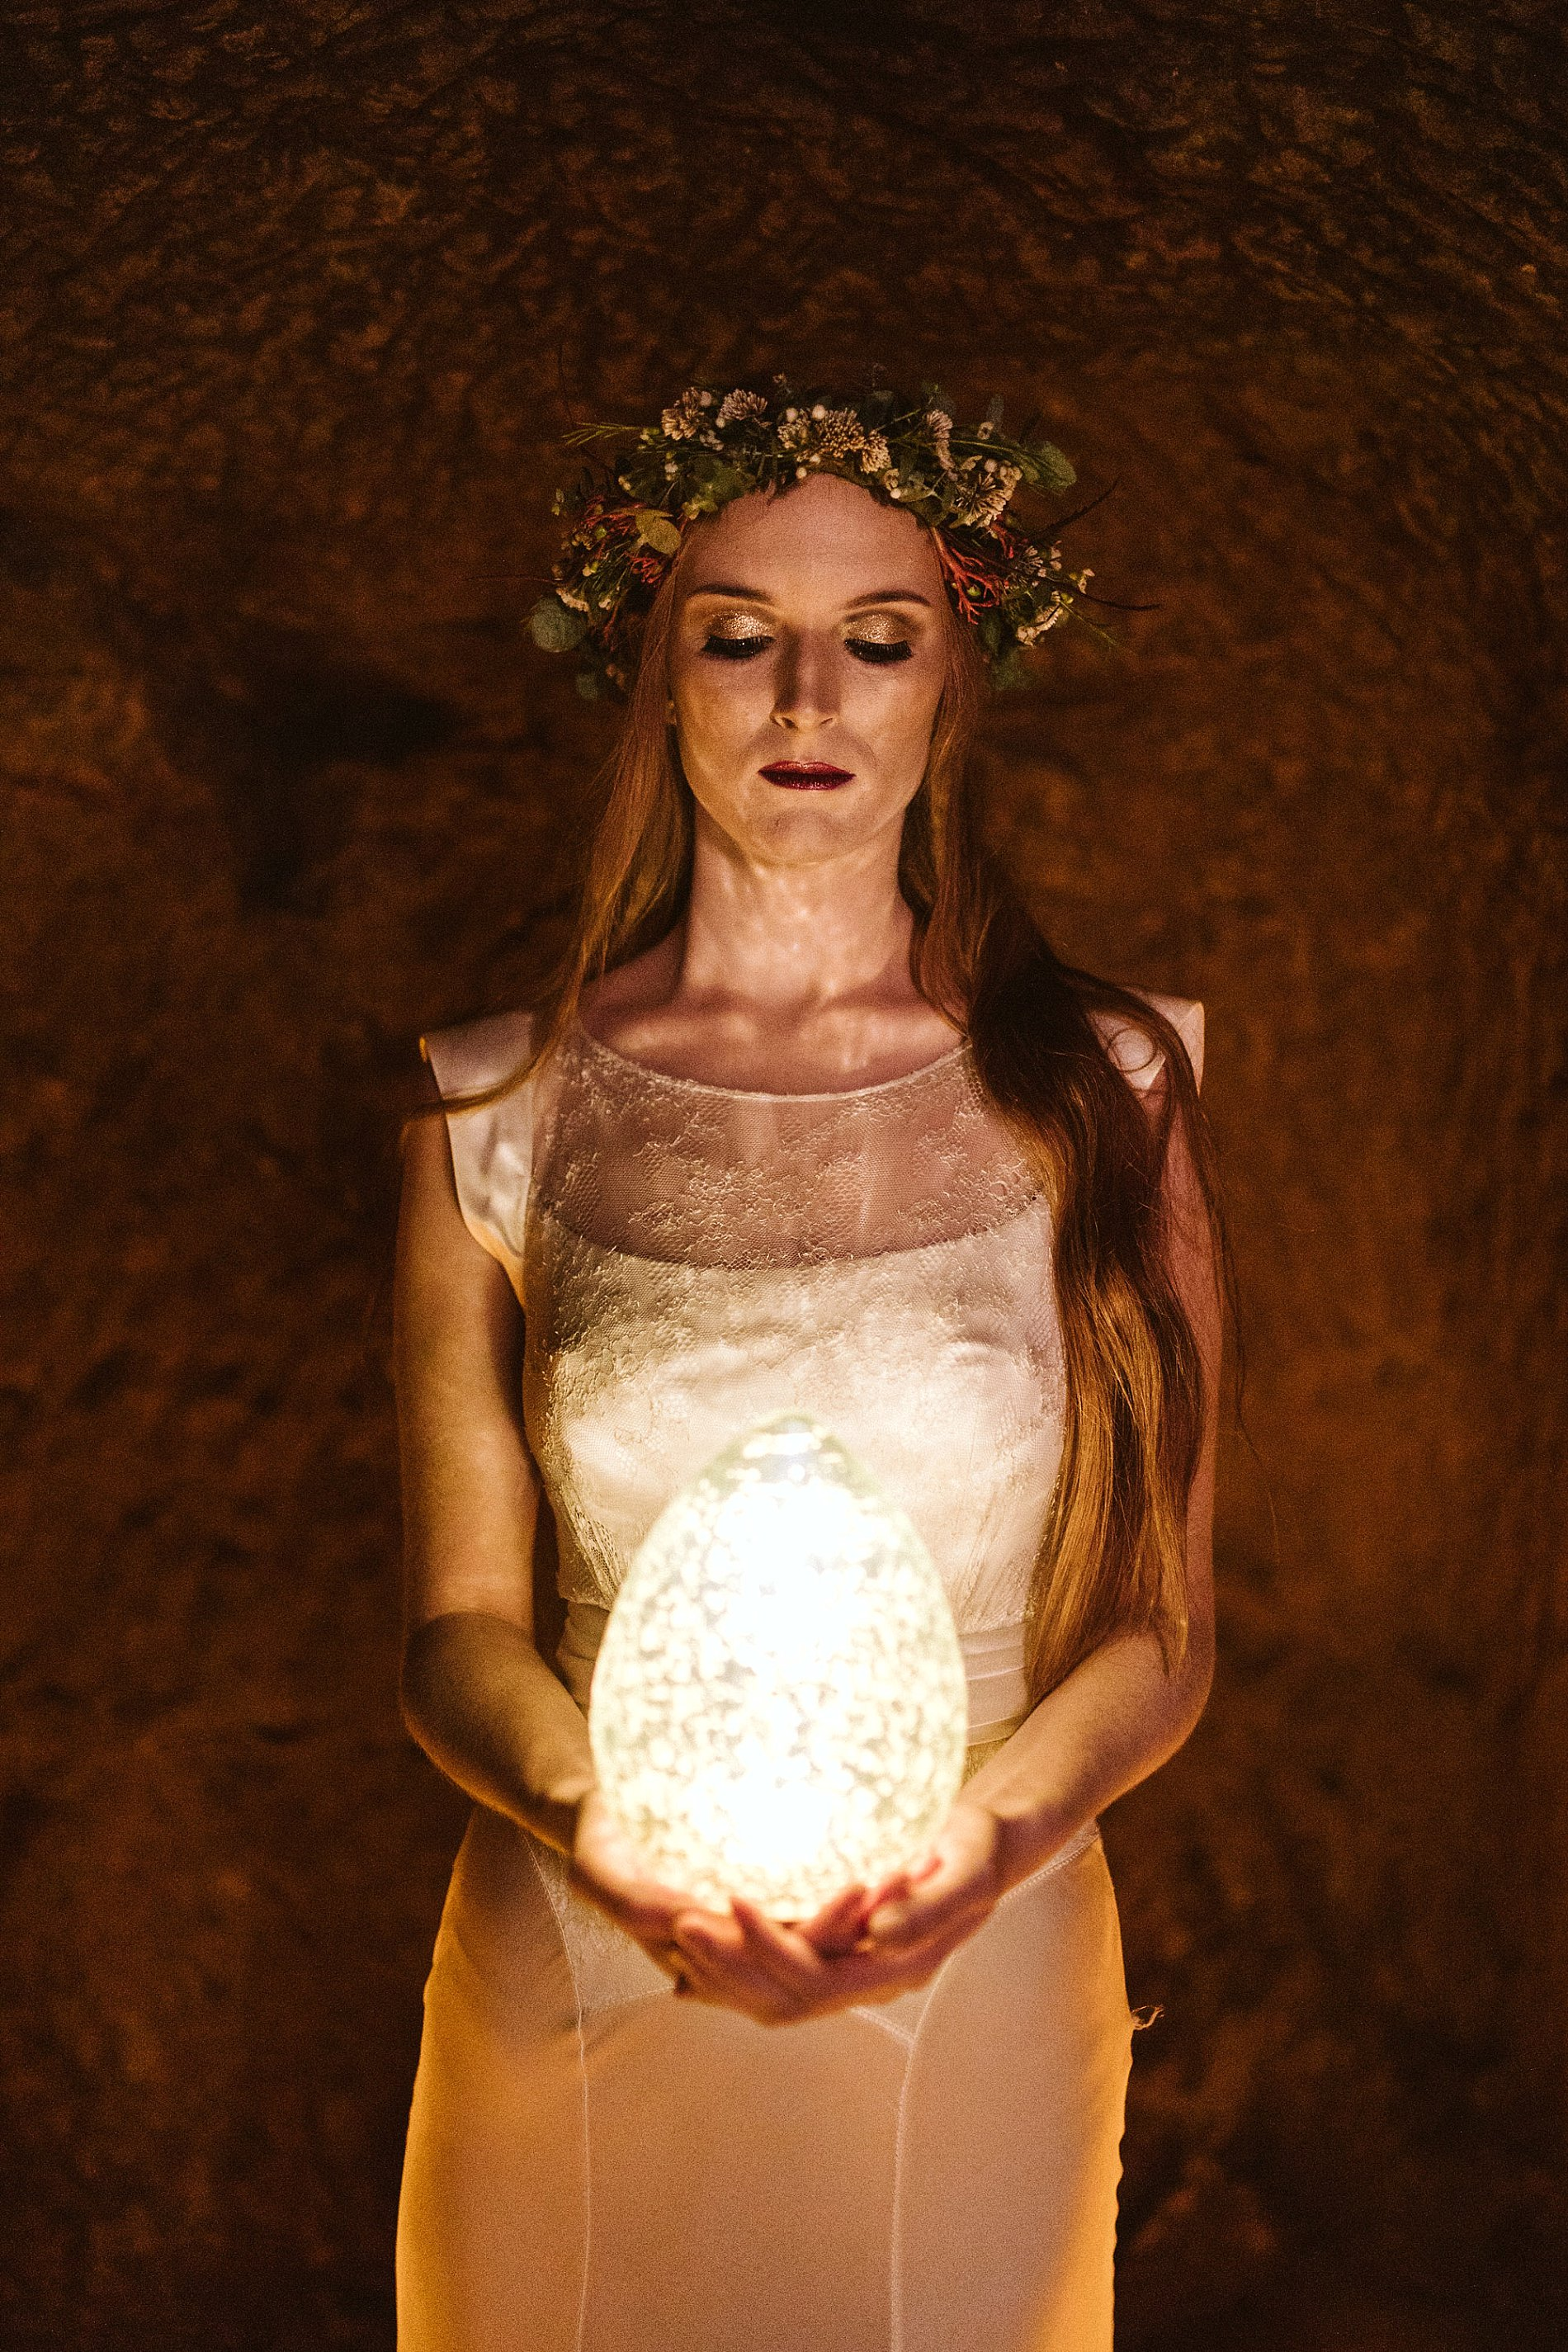 Game of Thrones Creative Bridal Shoot (c) Freya Raby (28)